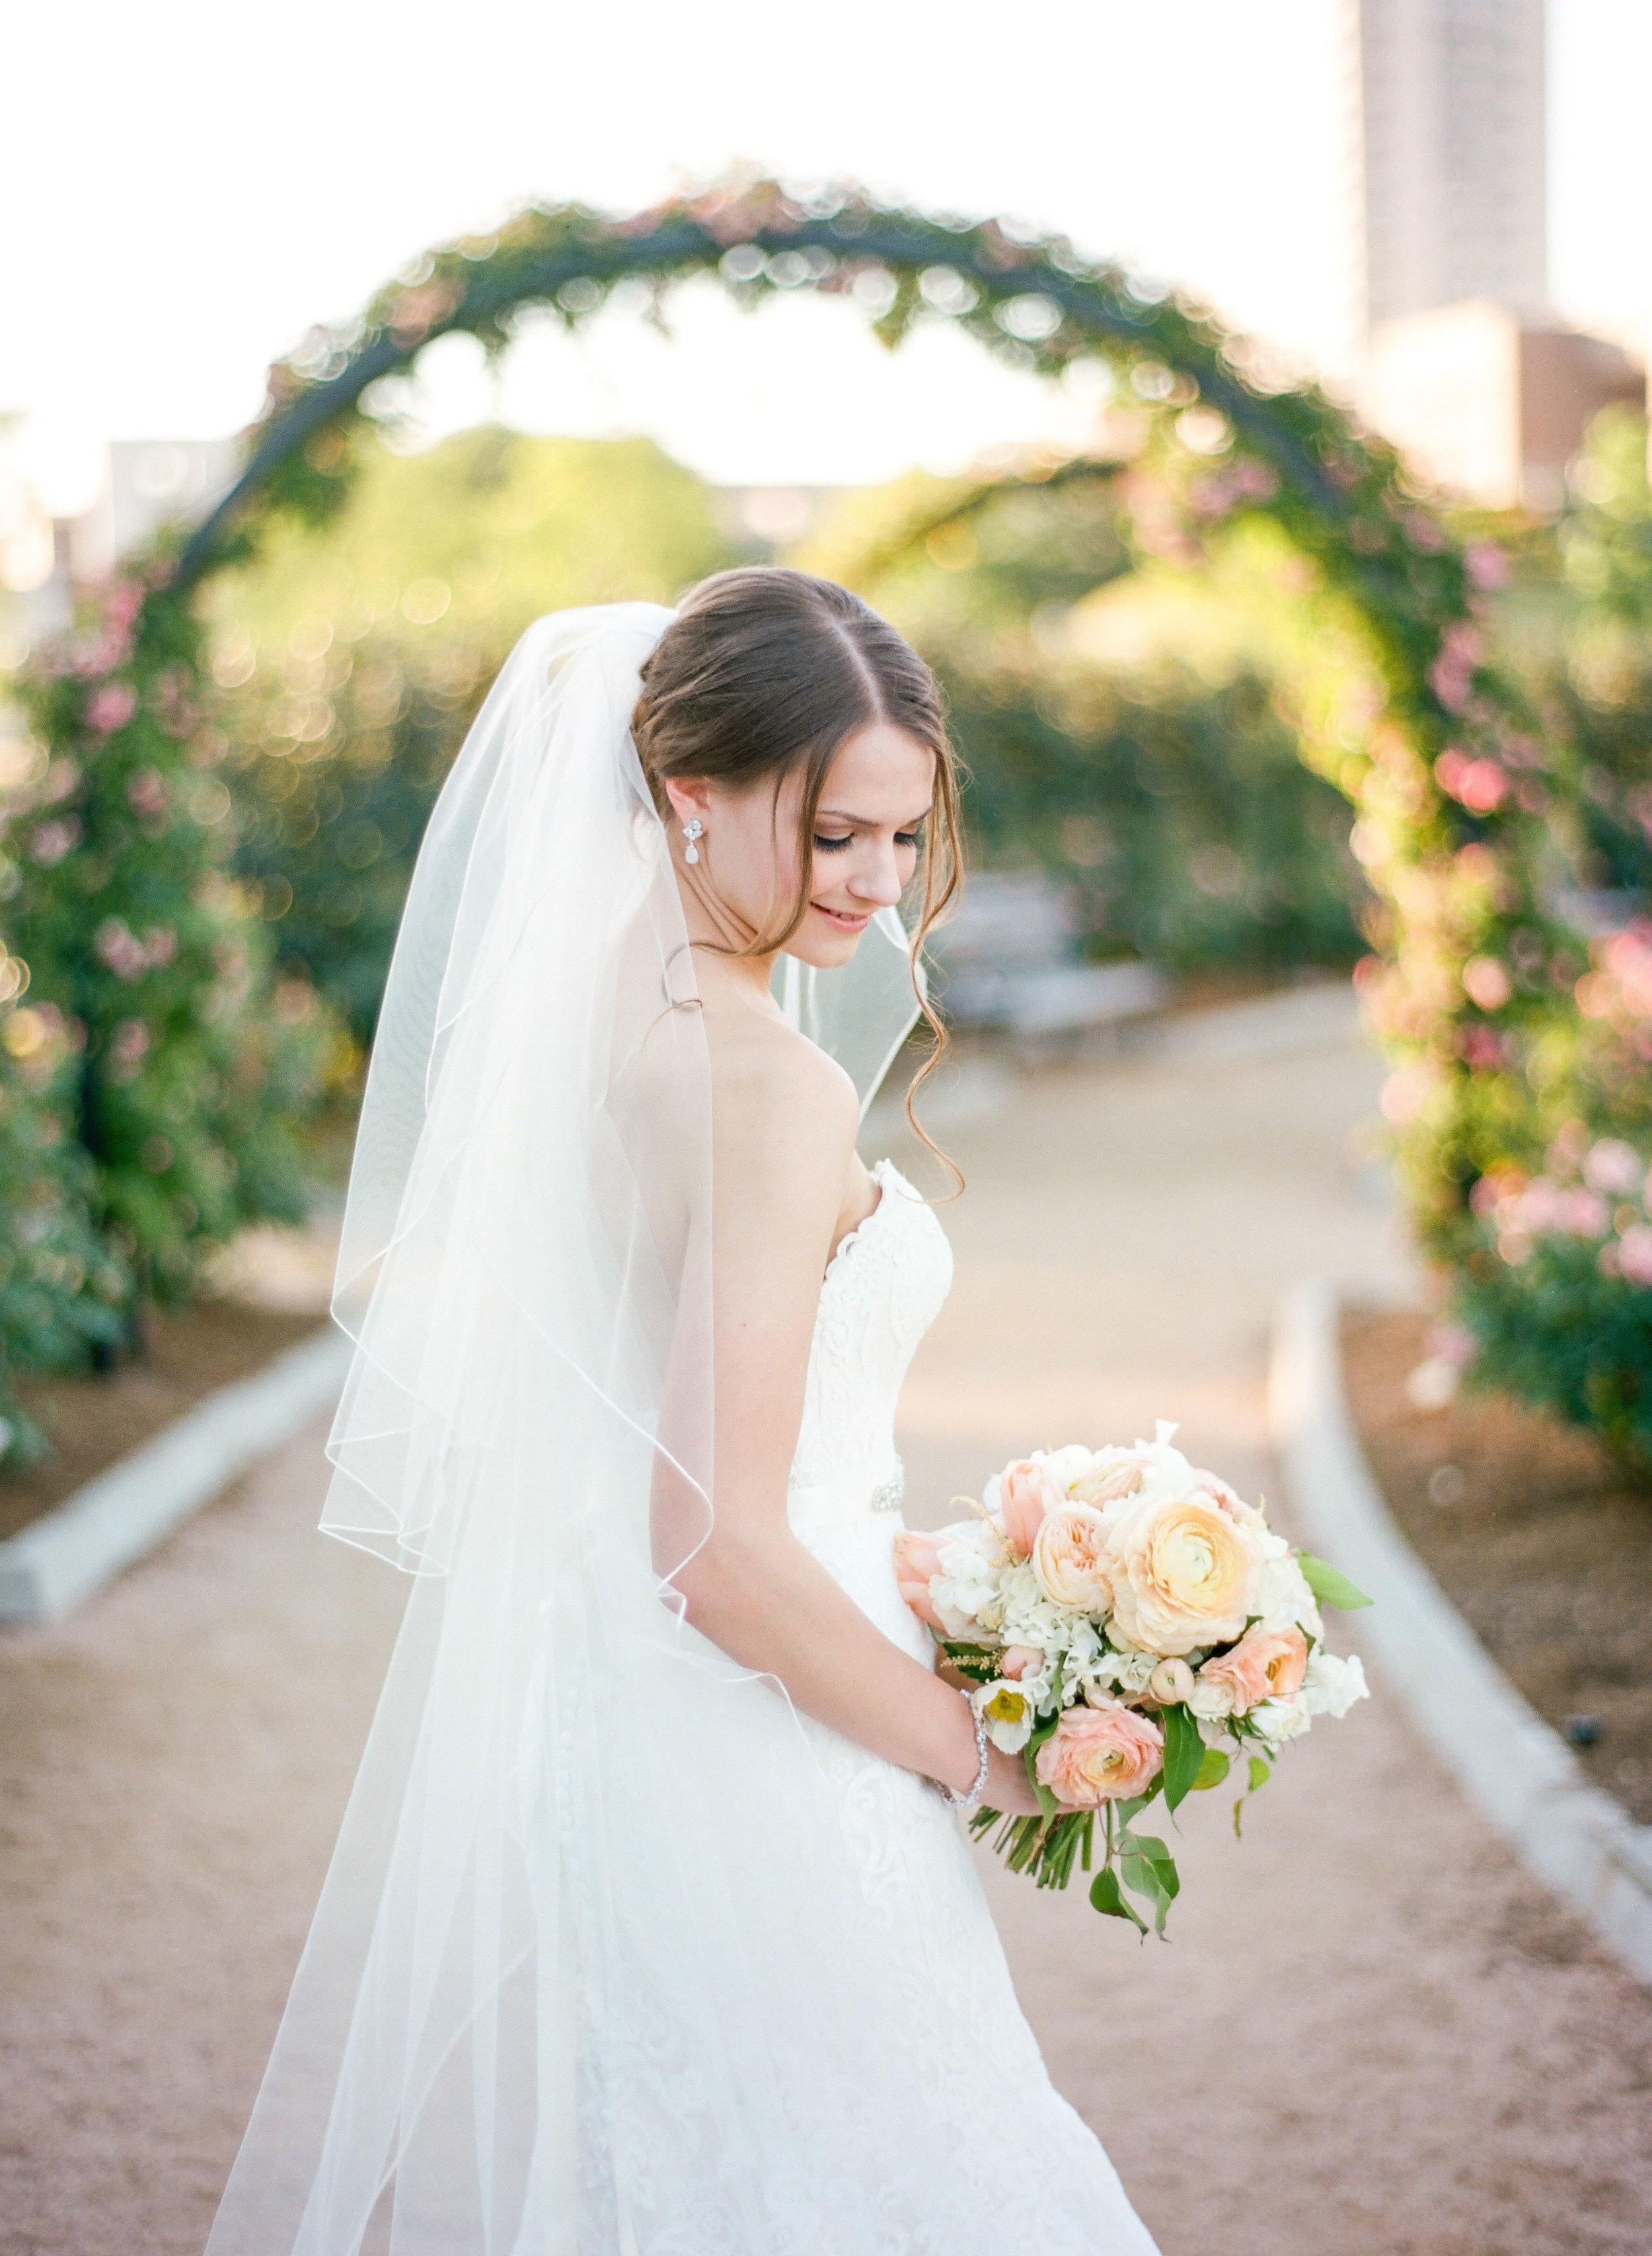 Houston-Wedding-Photographer-Film-Fine-Art-Bridals-Dana Fernandez-Photography-13.jpg